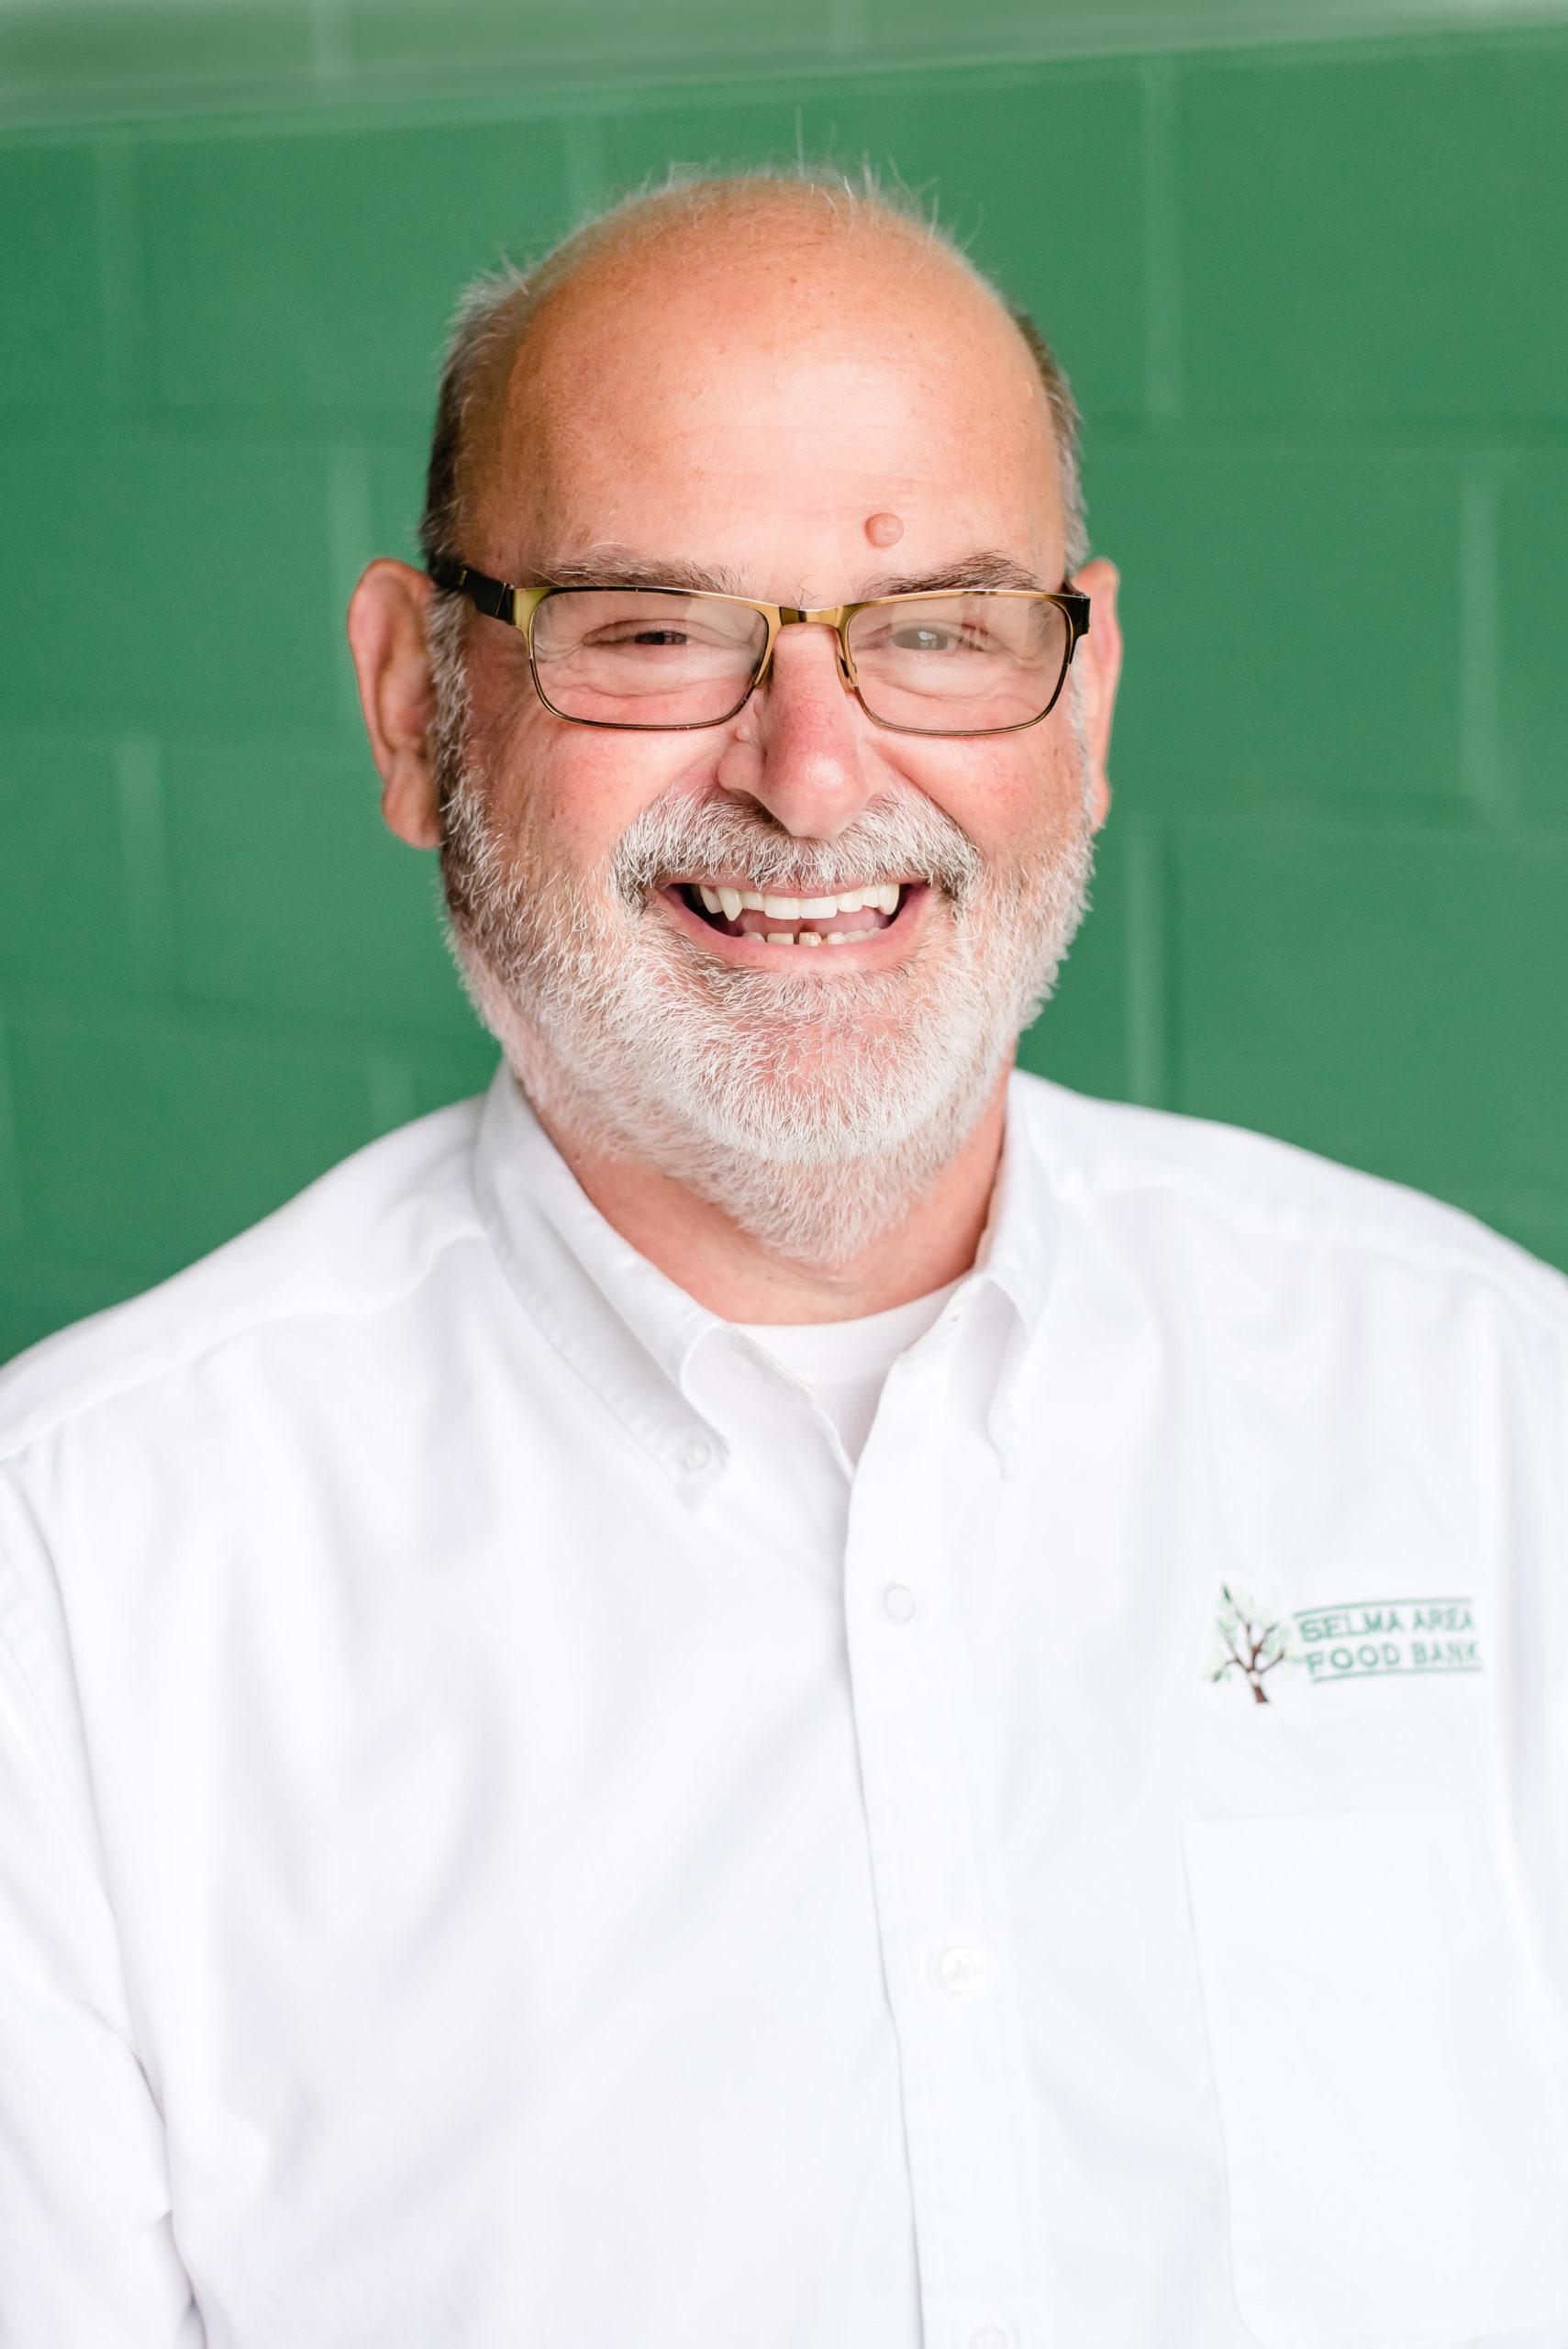 Image of Jeff Harrison - Director of Selma Food Bank